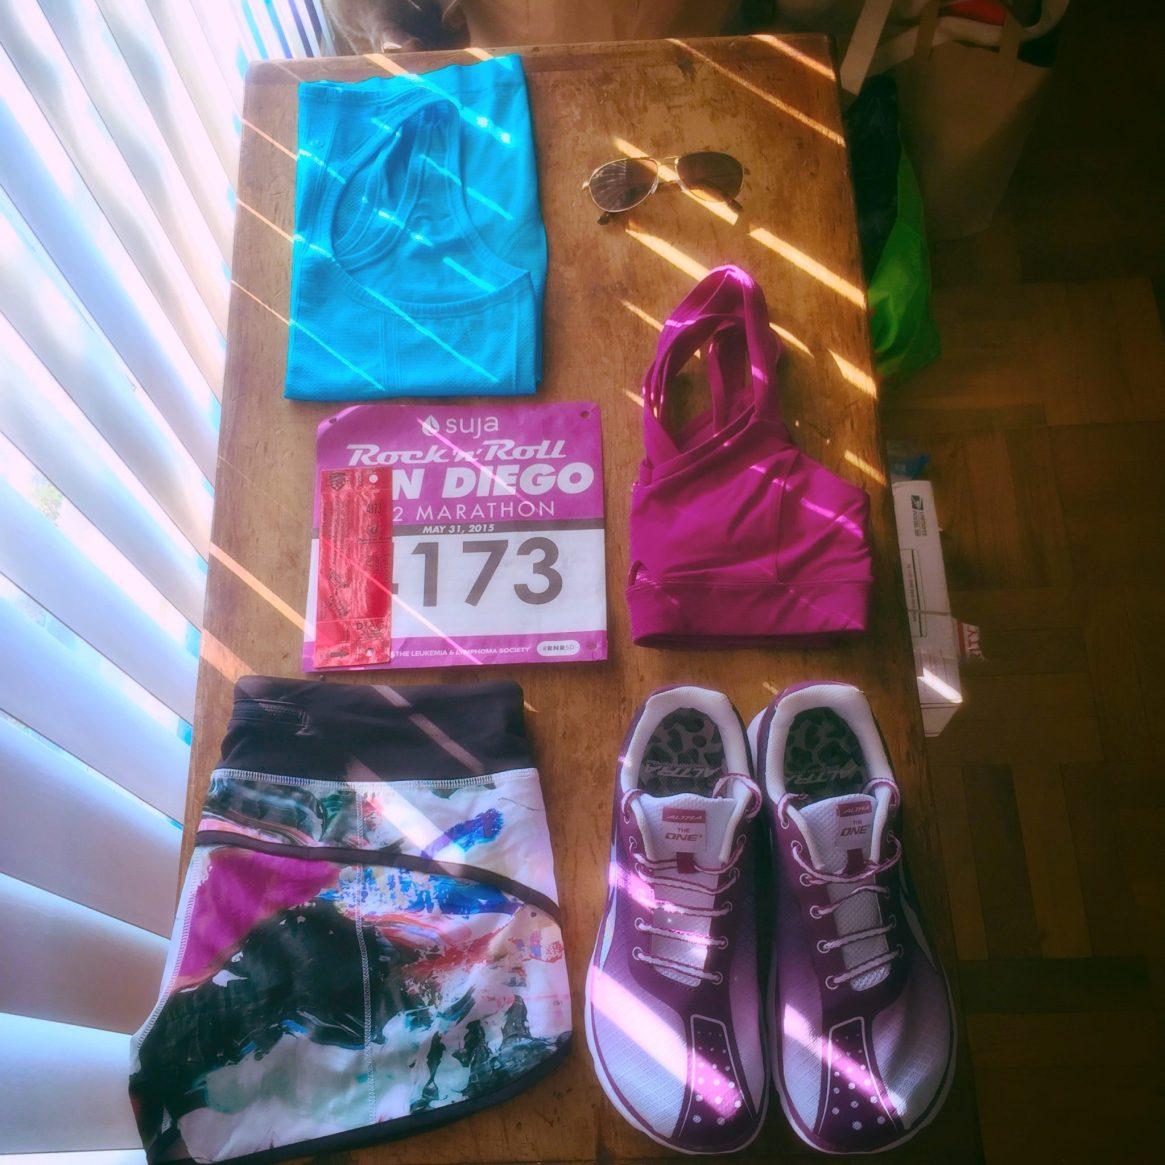 Flat Jenny, runnylegs, race outfit, rock n' roll, san diego, marathon, half marathon